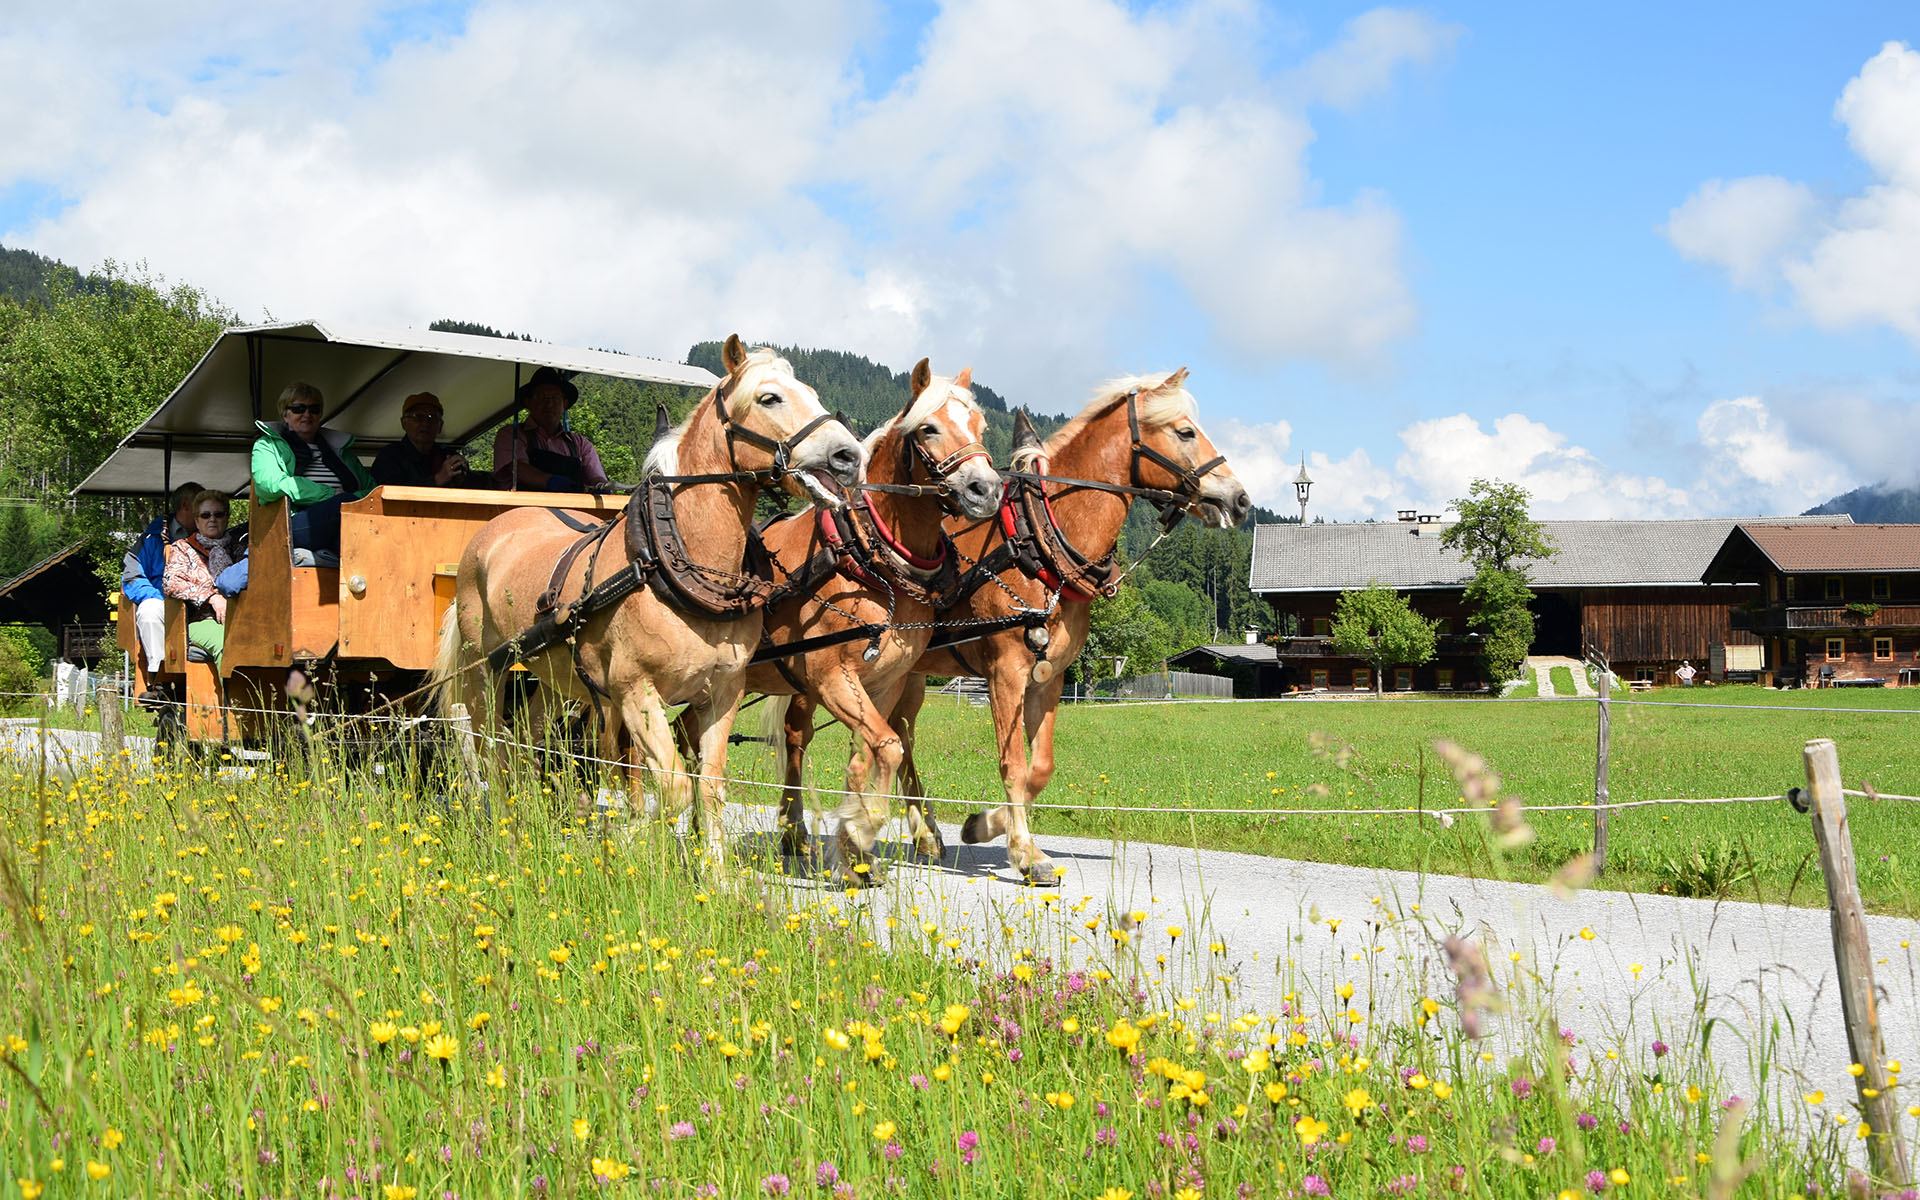 pferde1_1920x1200